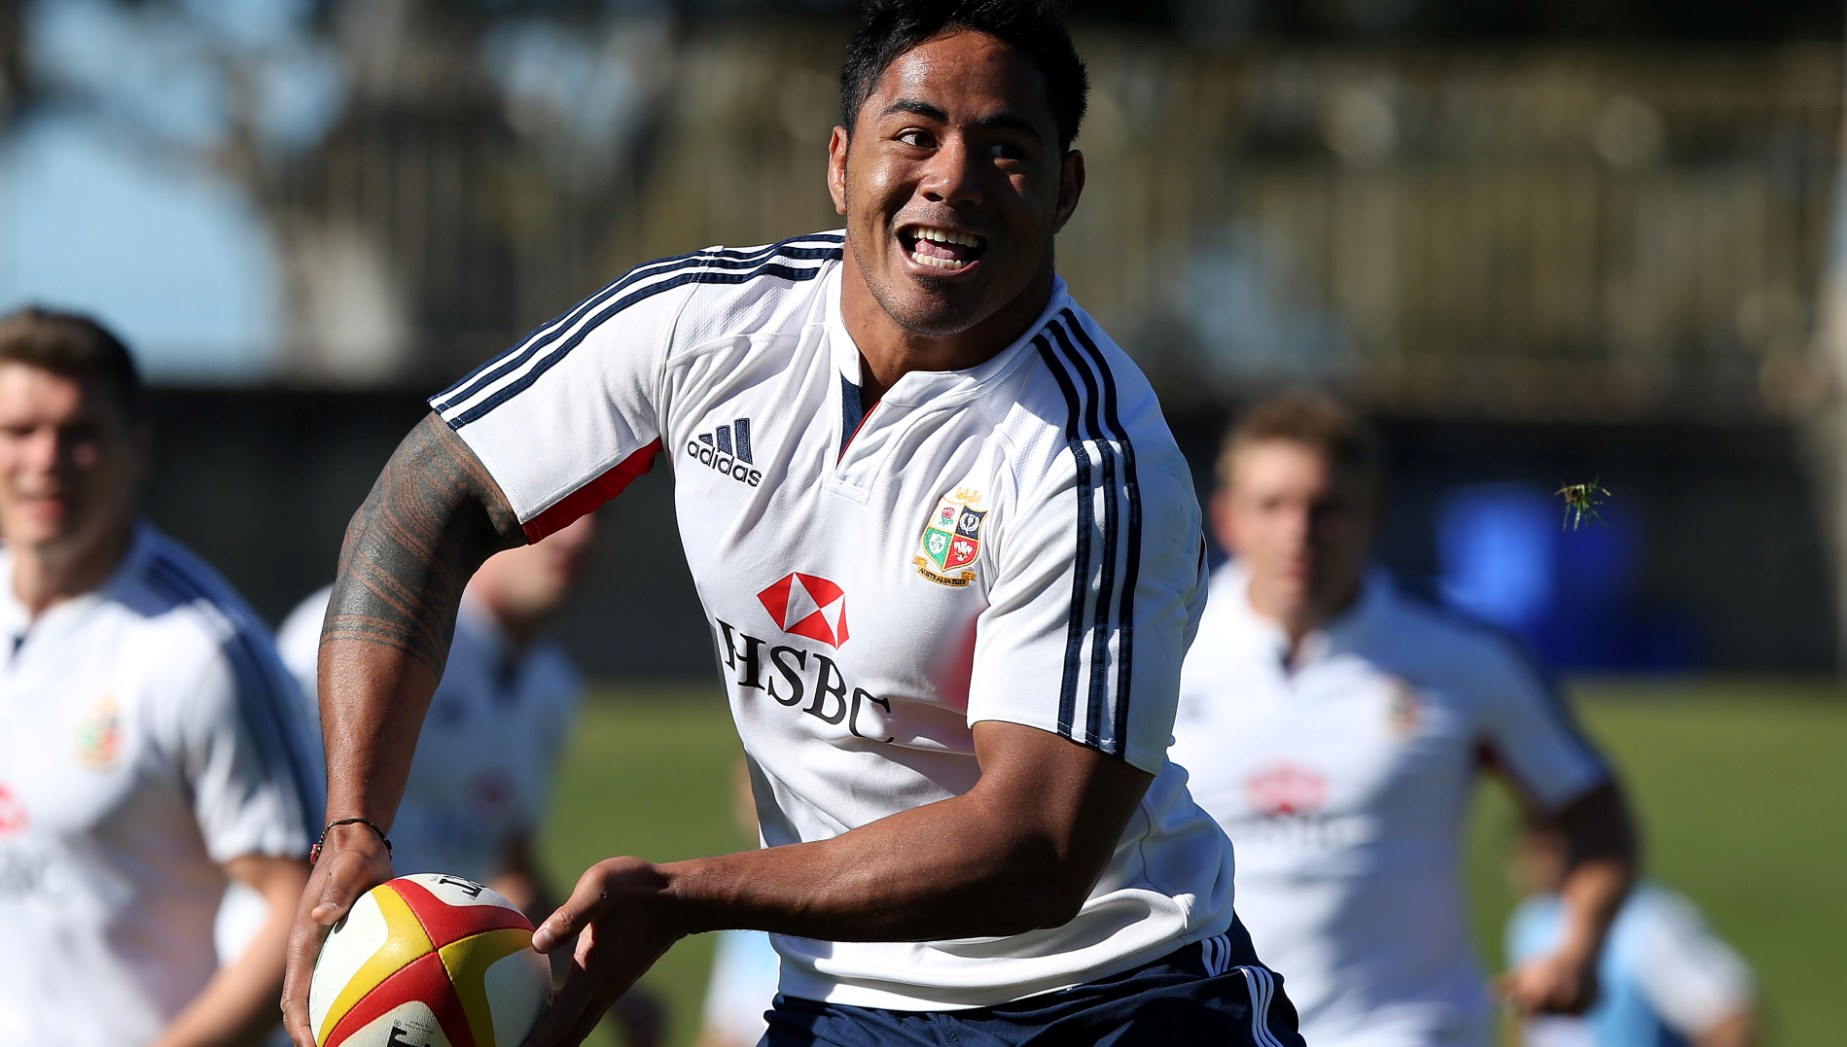 LionsWatch: Jones names England squad for 2017